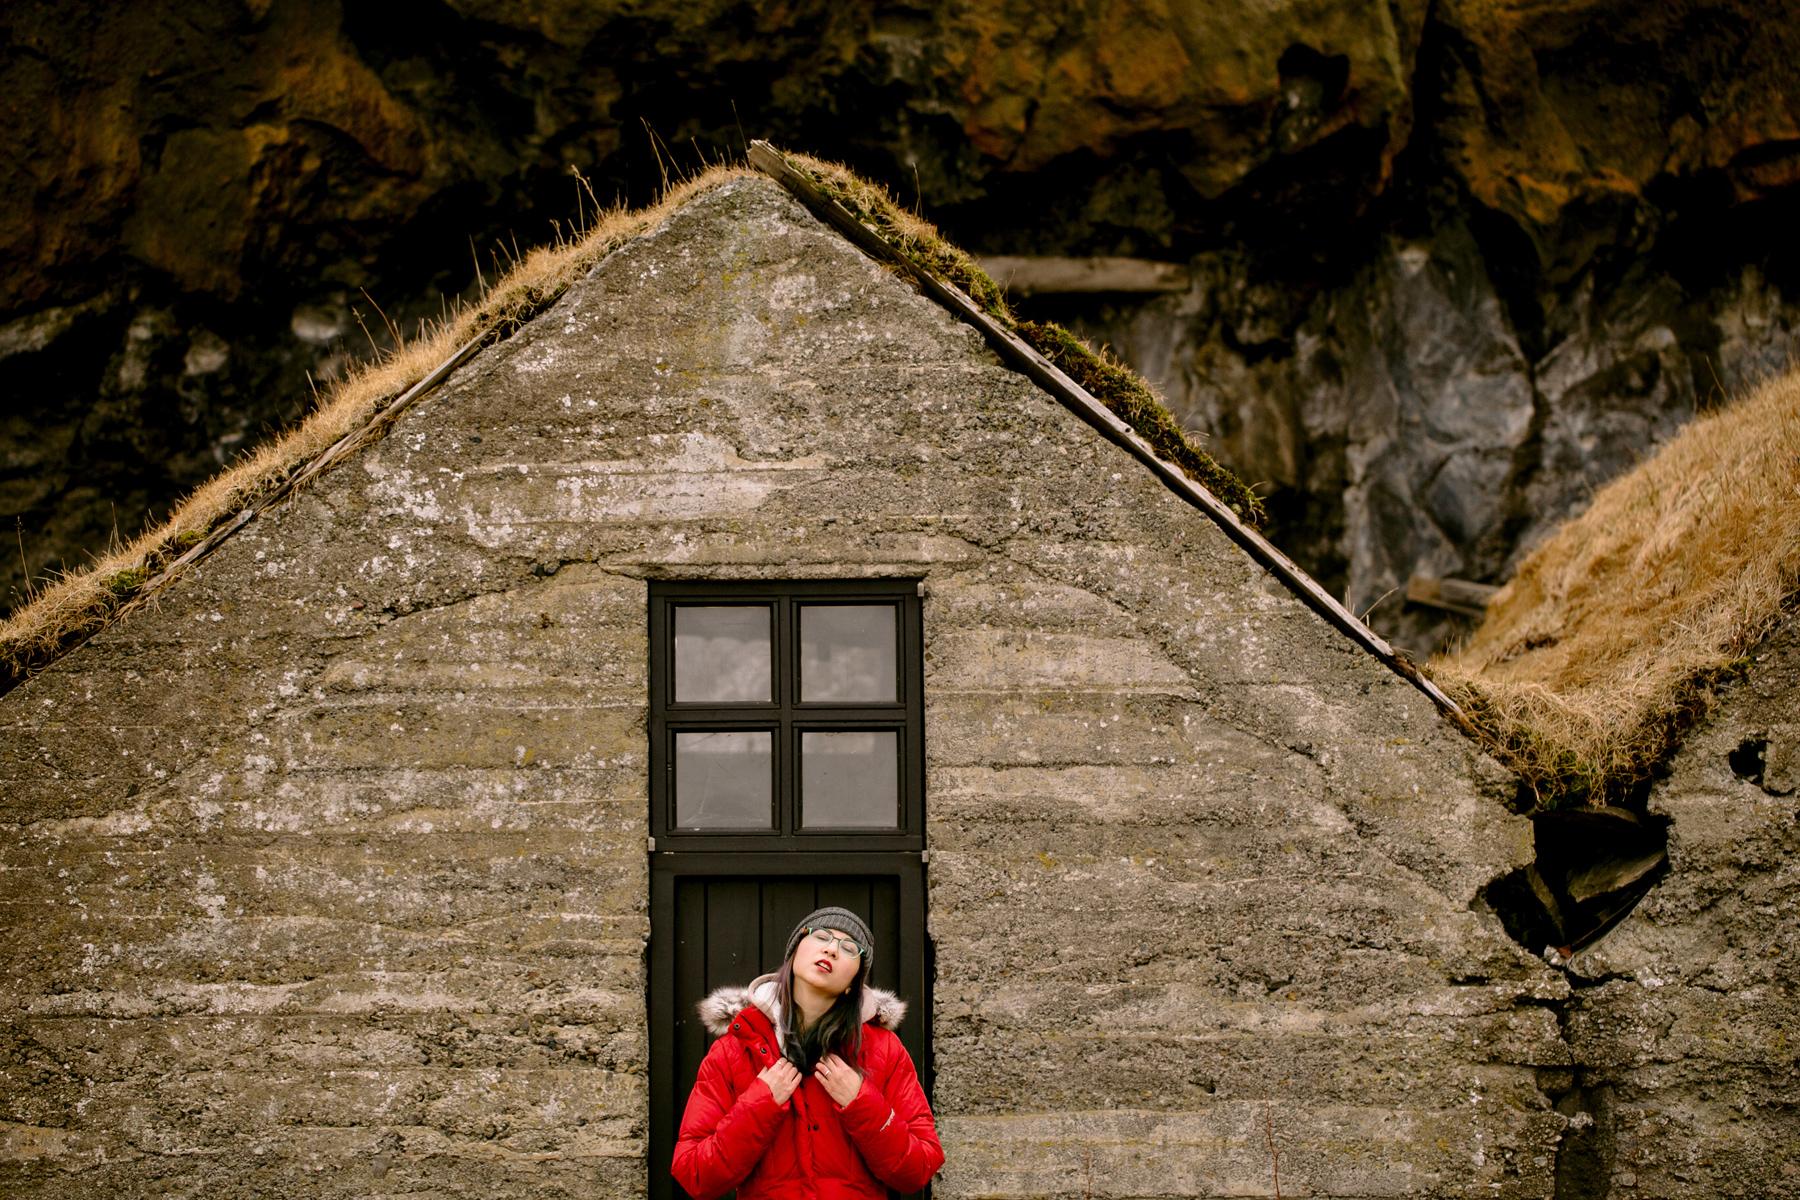 012-epic-iceland-photographer-portraits-kandisebrown-2016